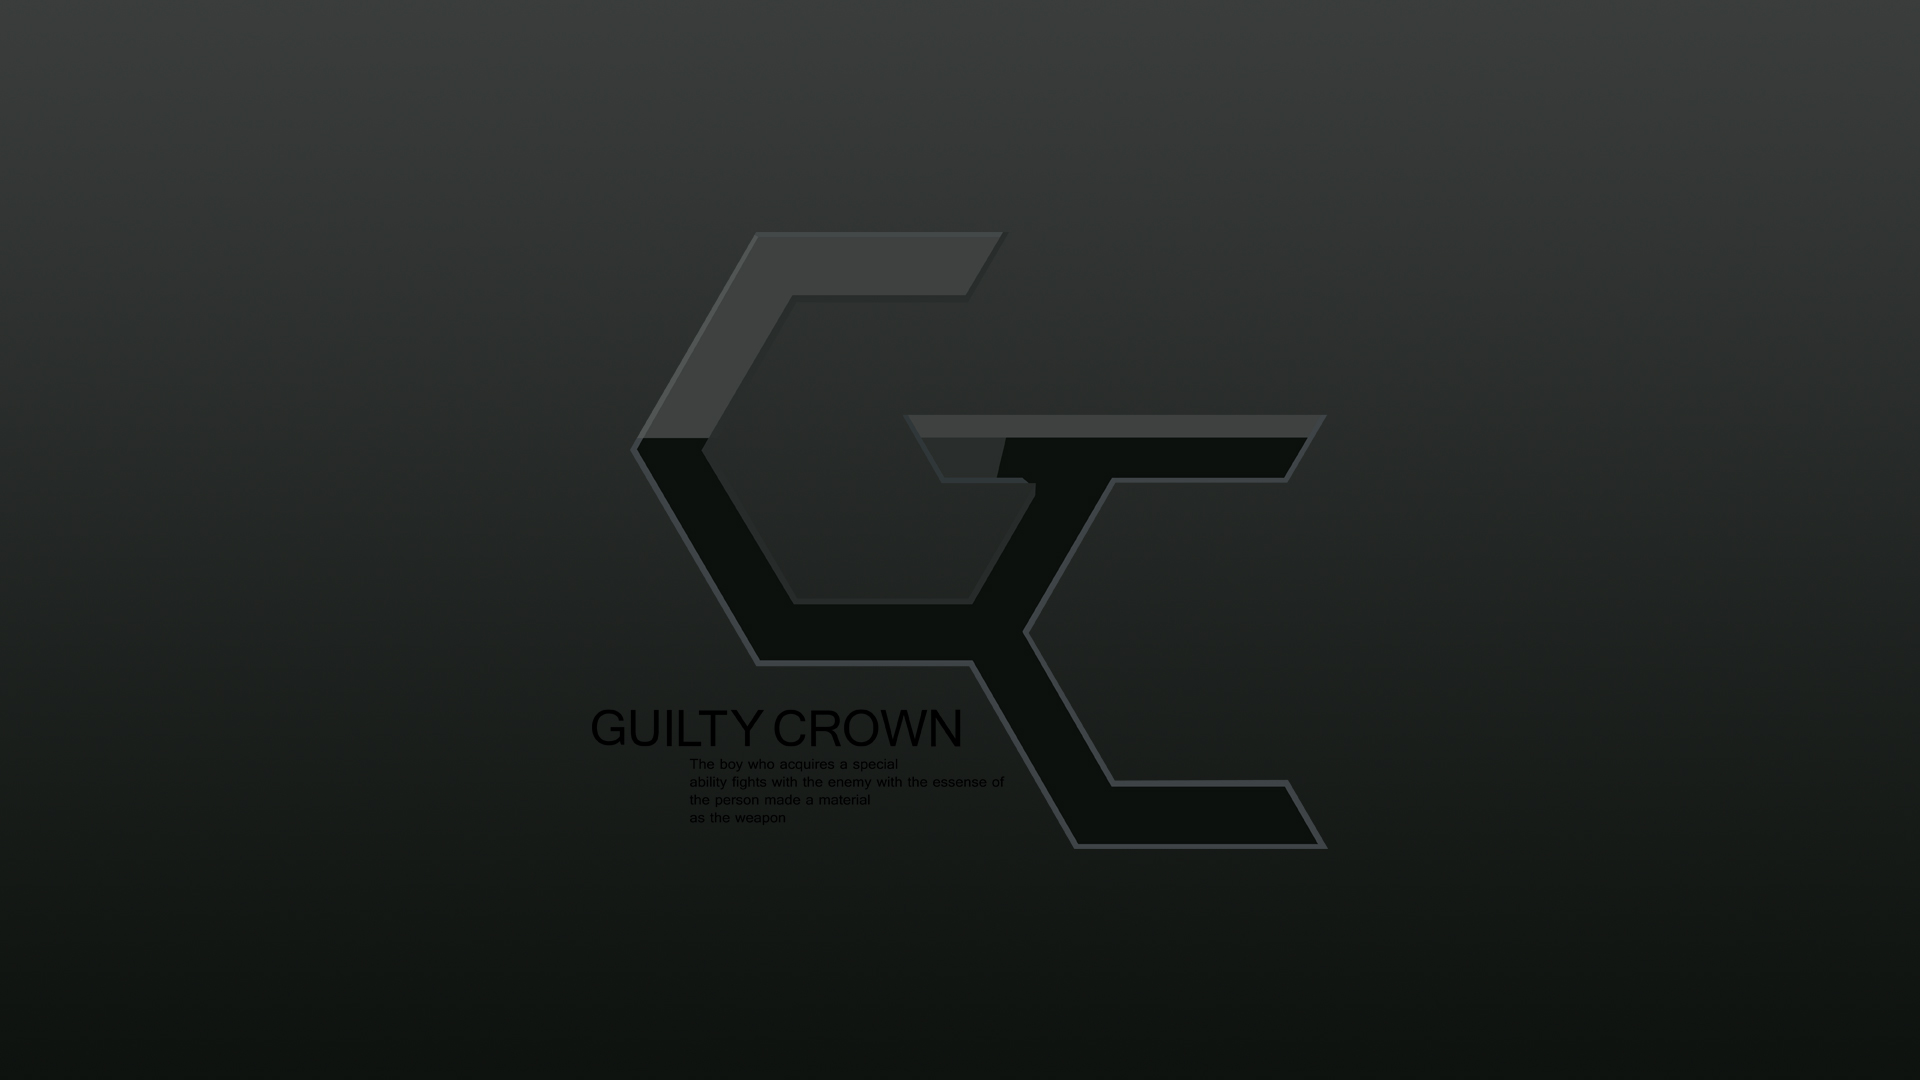 Crown Wallpaper Guilty crown wallpaper 1920x1080